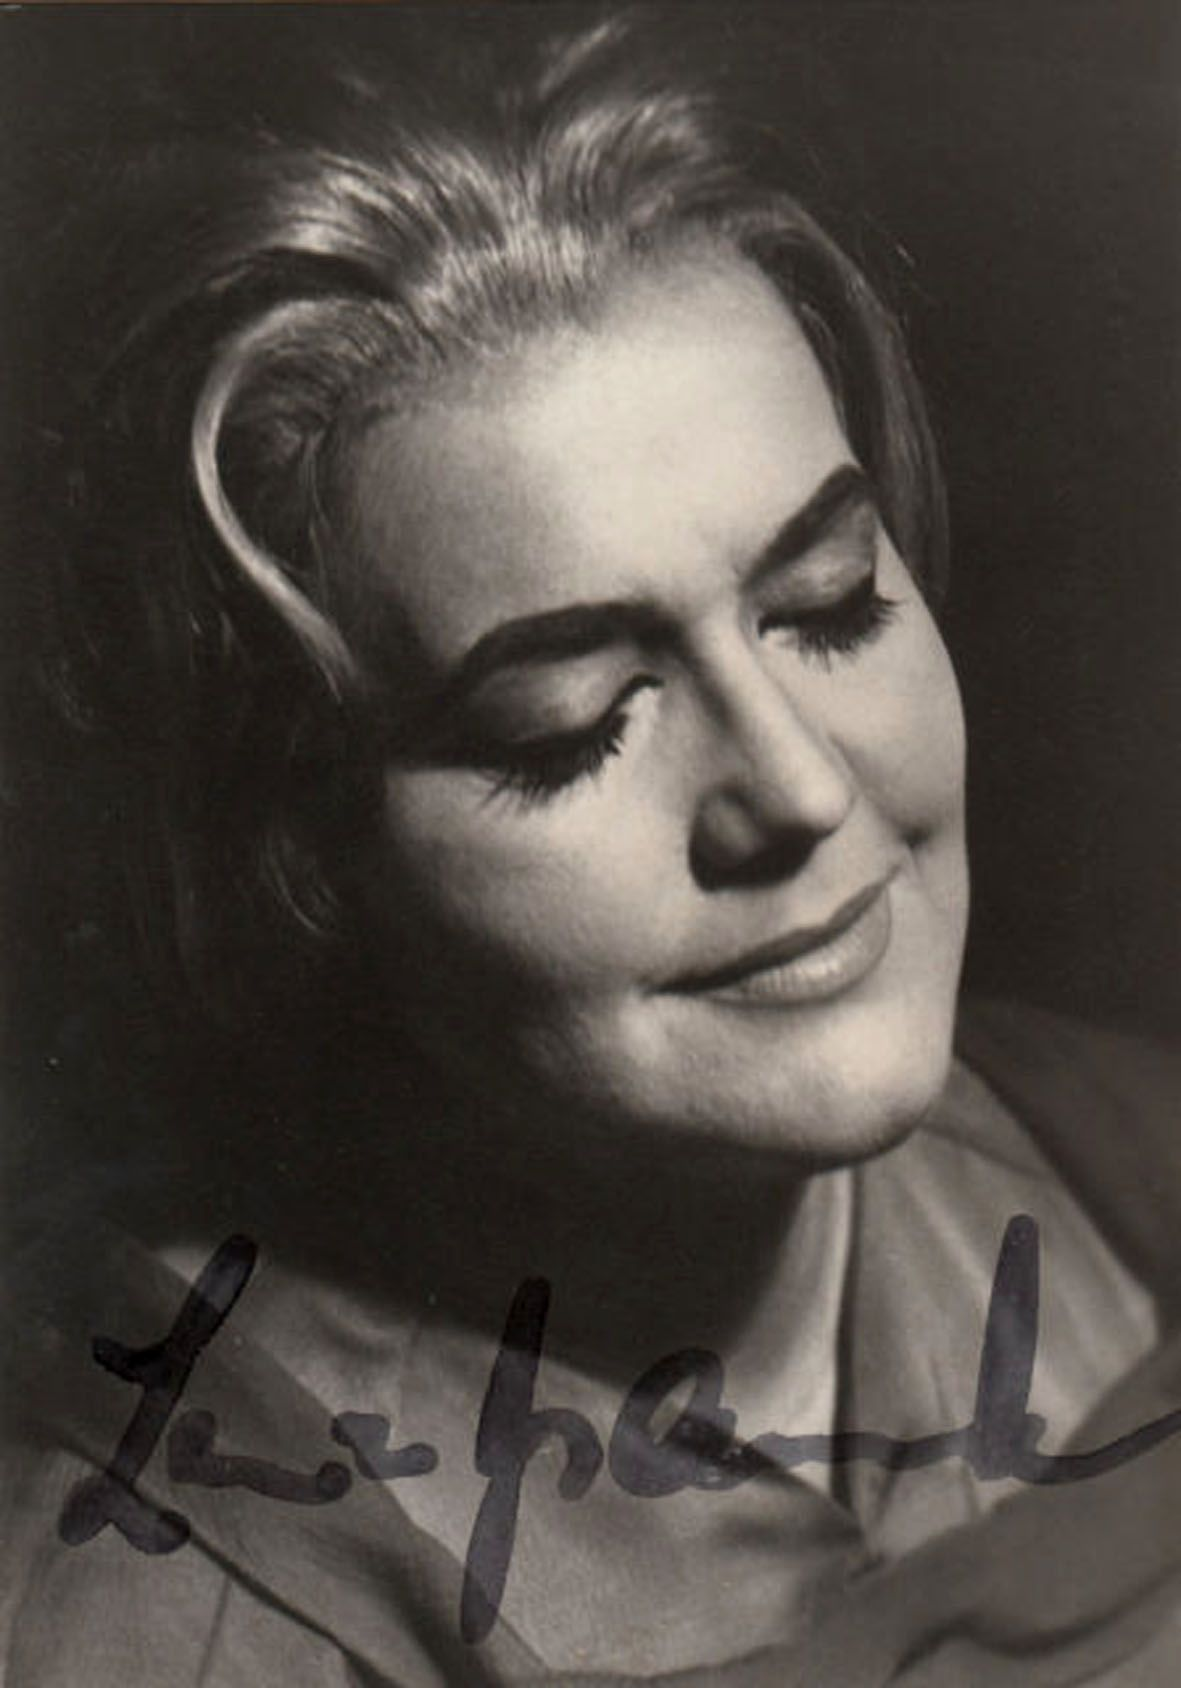 Leonie Rysanek 1965 Diva! in 2019 Opera singers, Opera